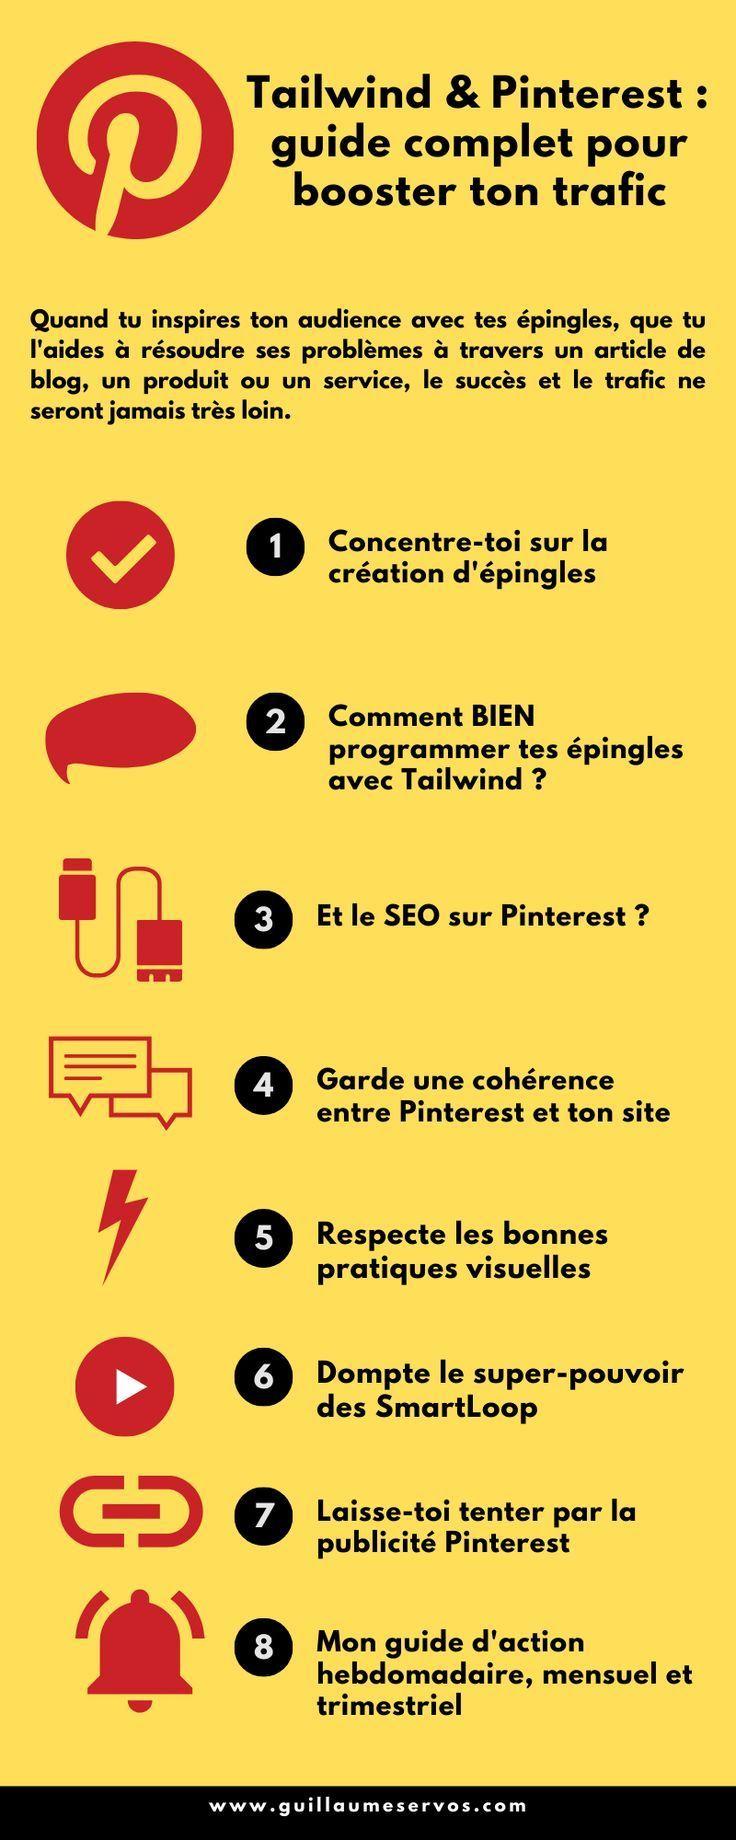 Tailwind Pinterest Guide Complet Pour Booster Ton Trafic Guillaume Servos Trafic Astuce Pinterest Gagner De L Argent